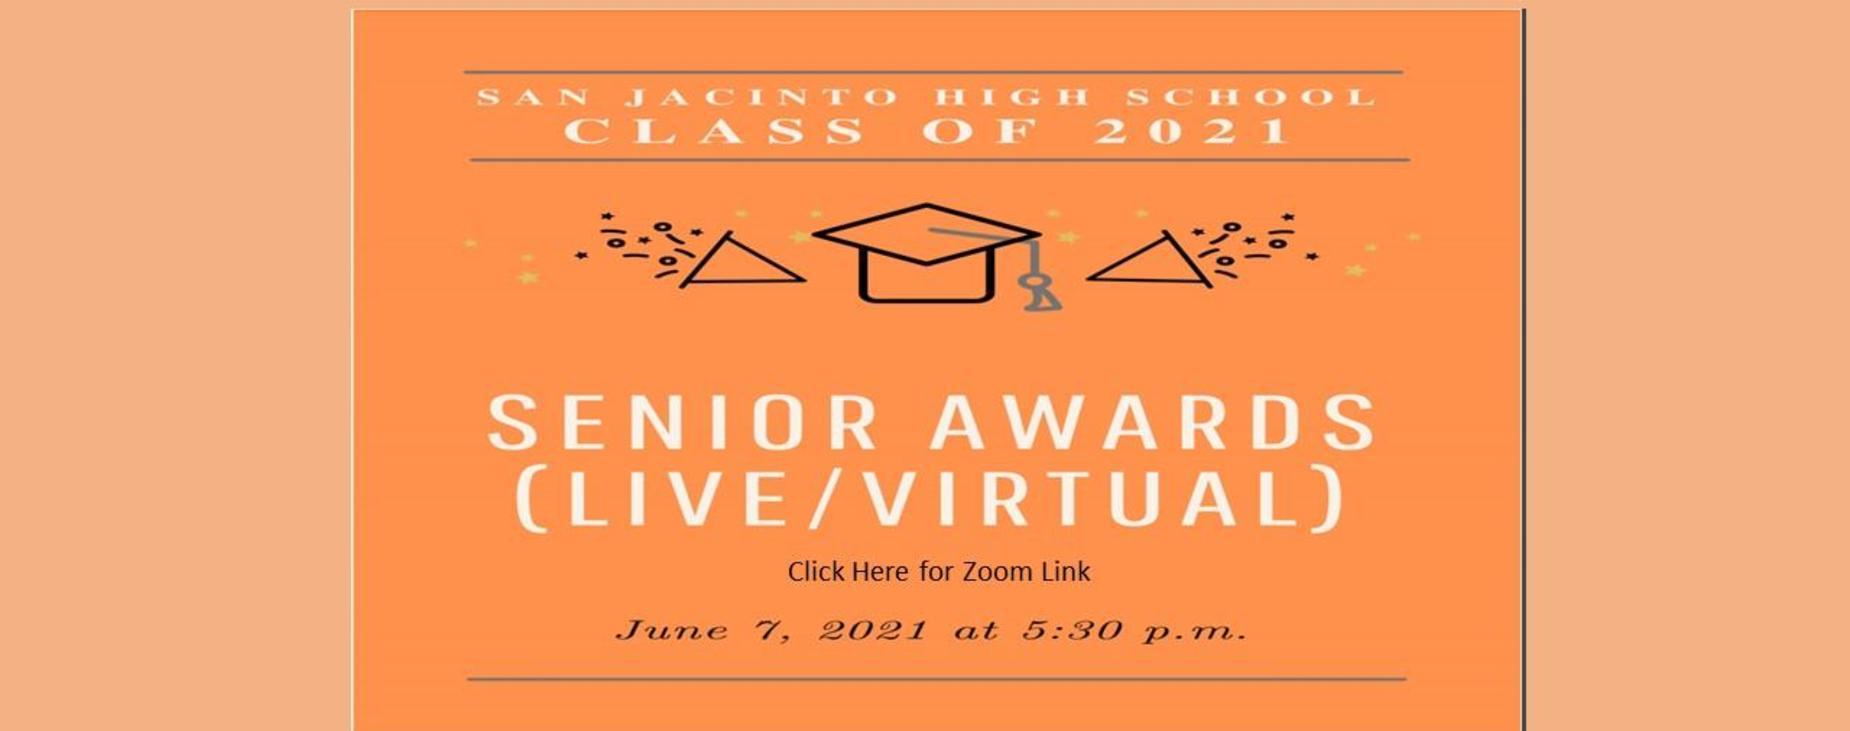 Senior Awards